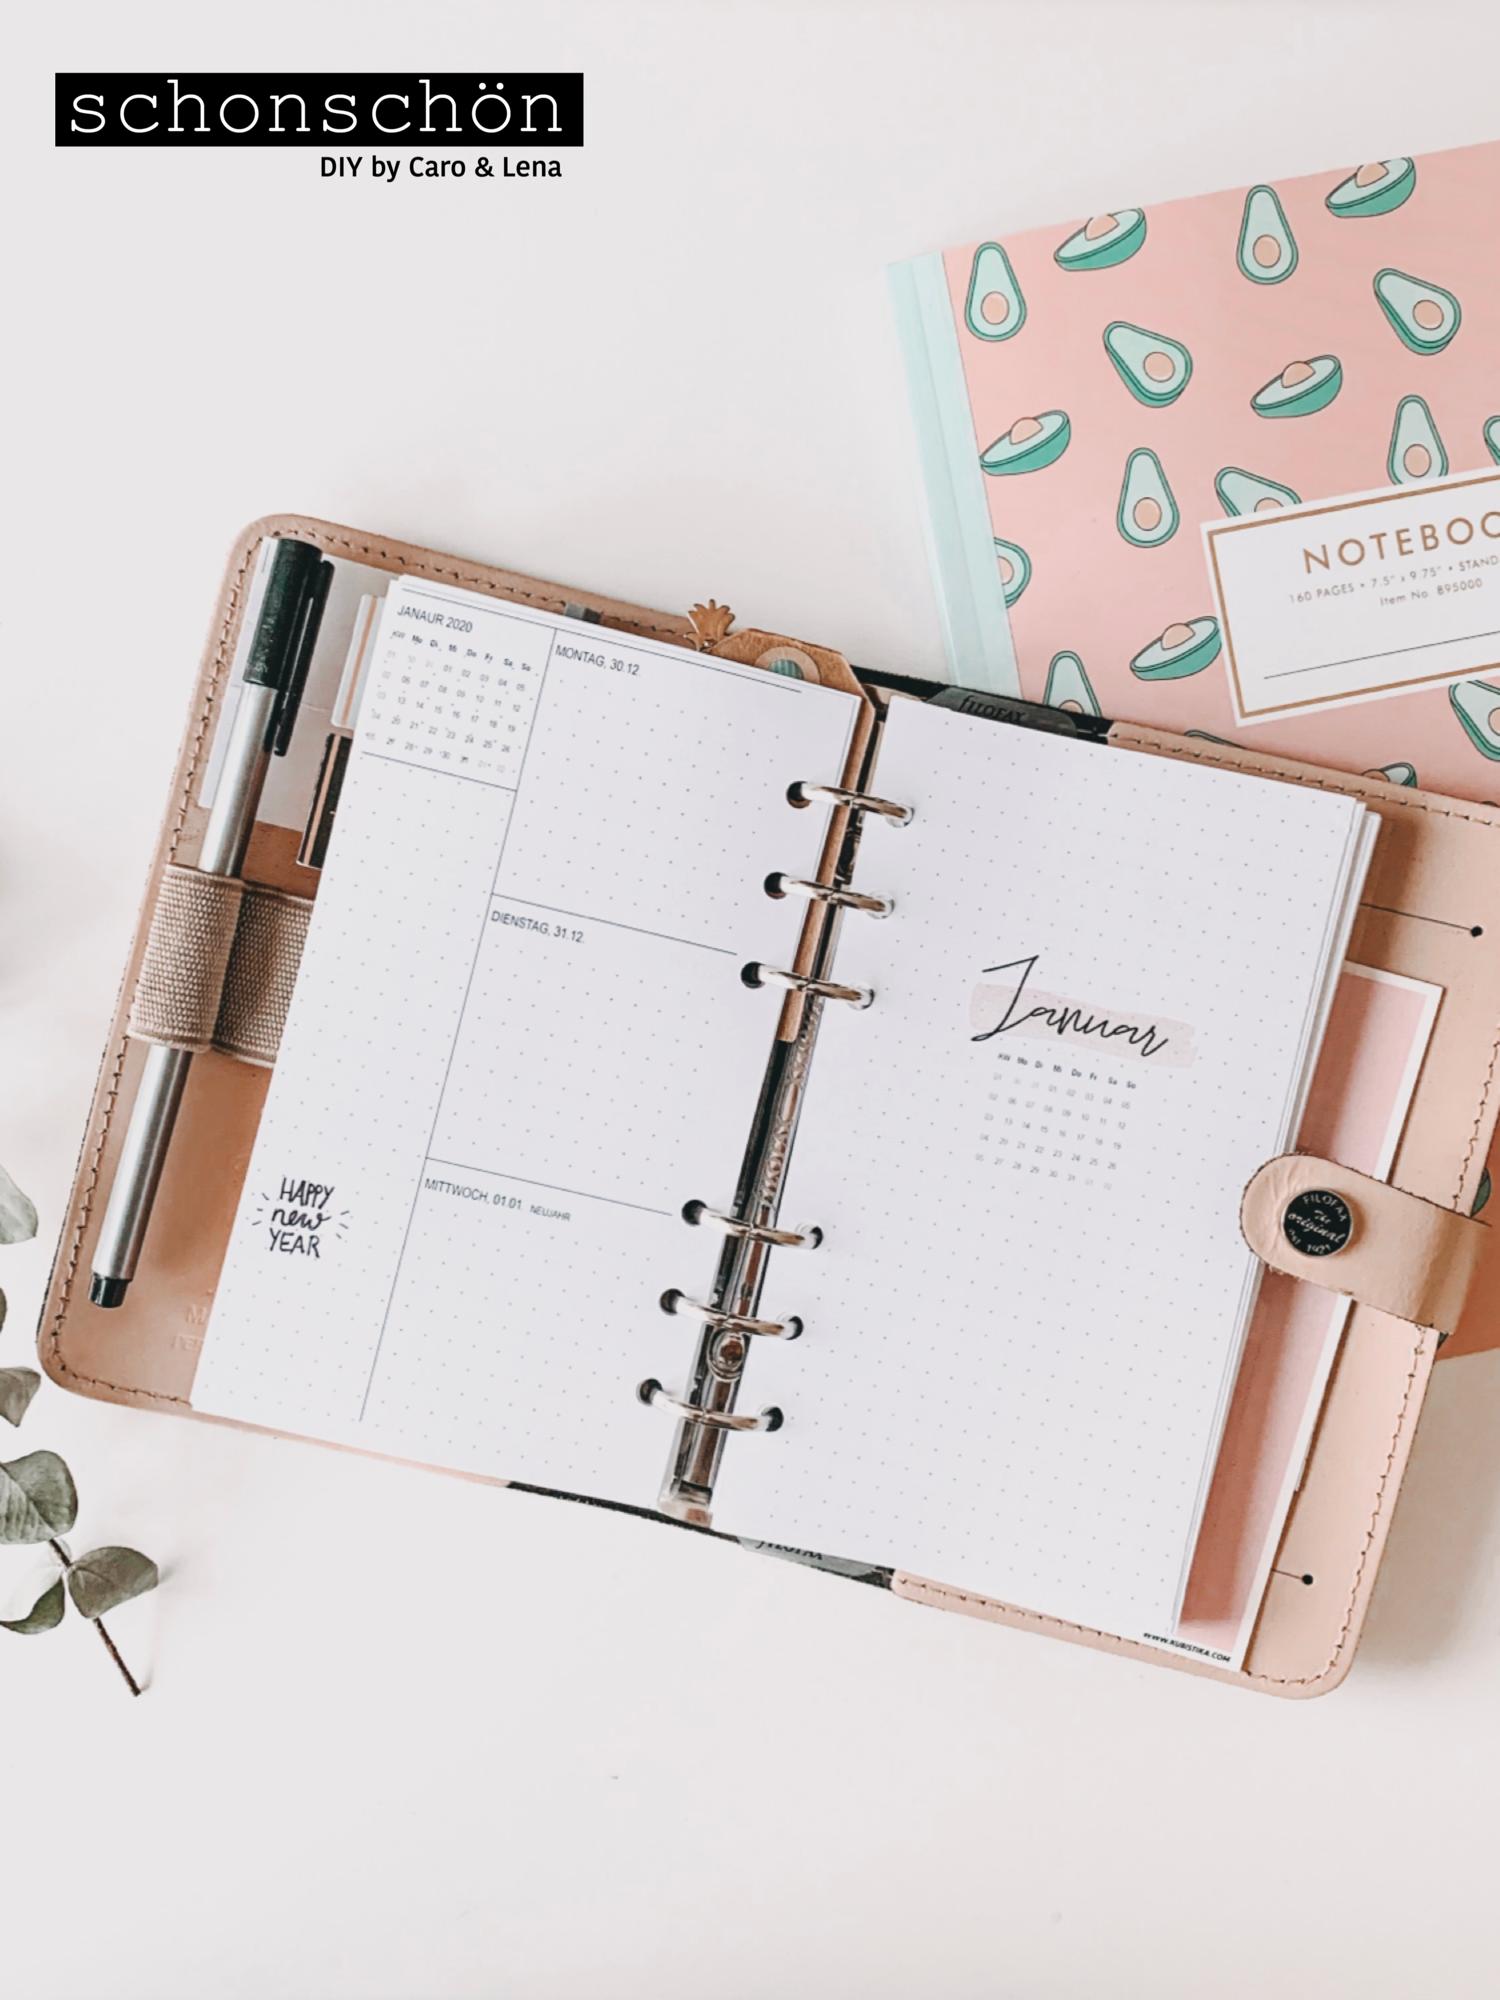 Kostenloser Download Filofax Kalender 2020 Terminplaner Vorlage Filofax Kalender Kalender Organisation